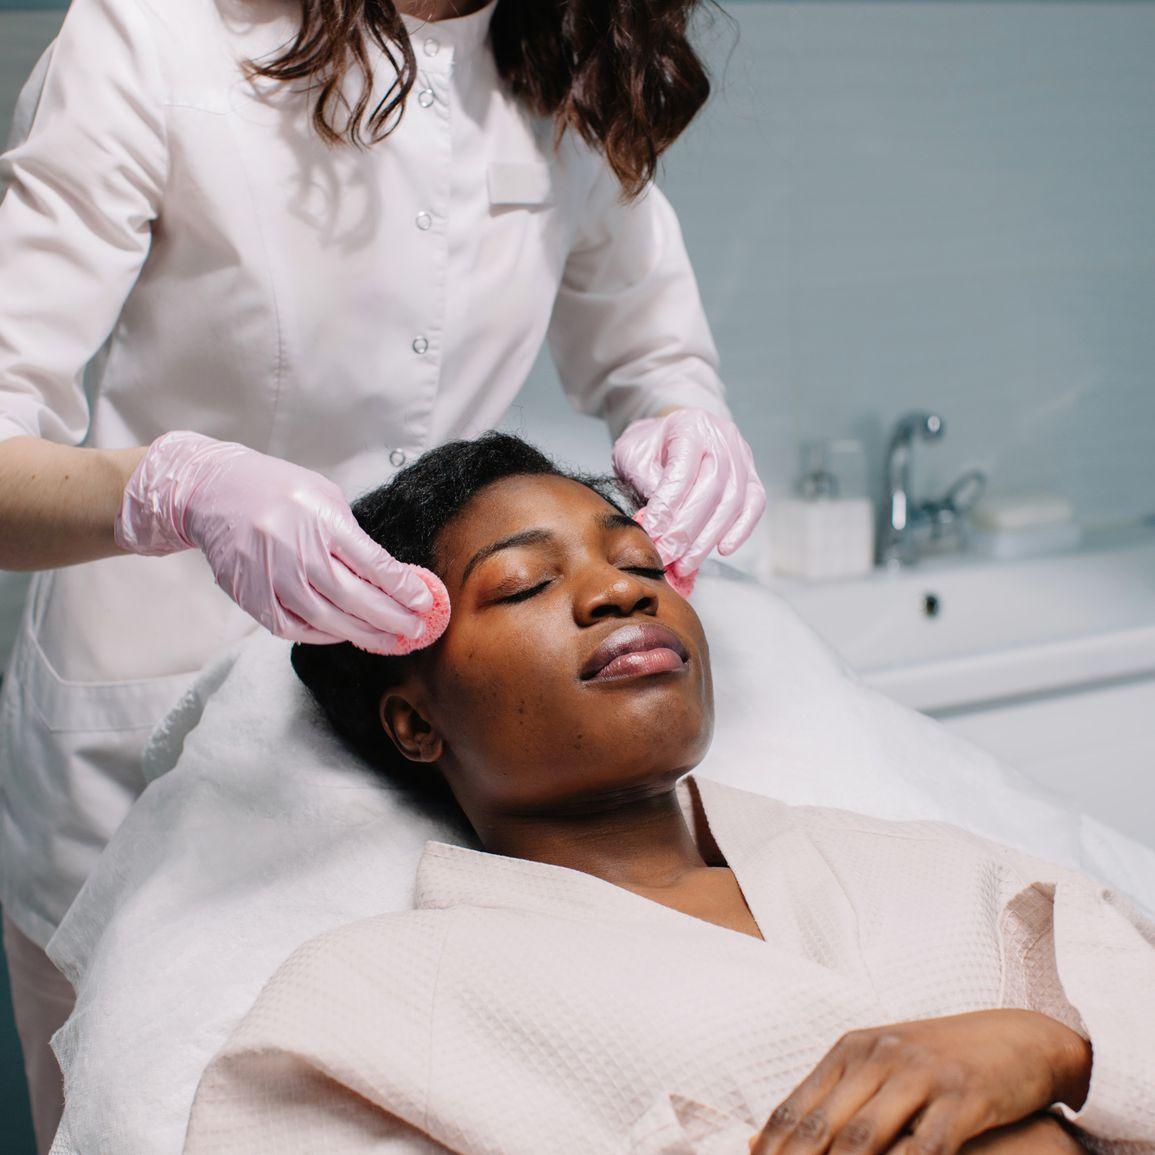 black femme getting a facial